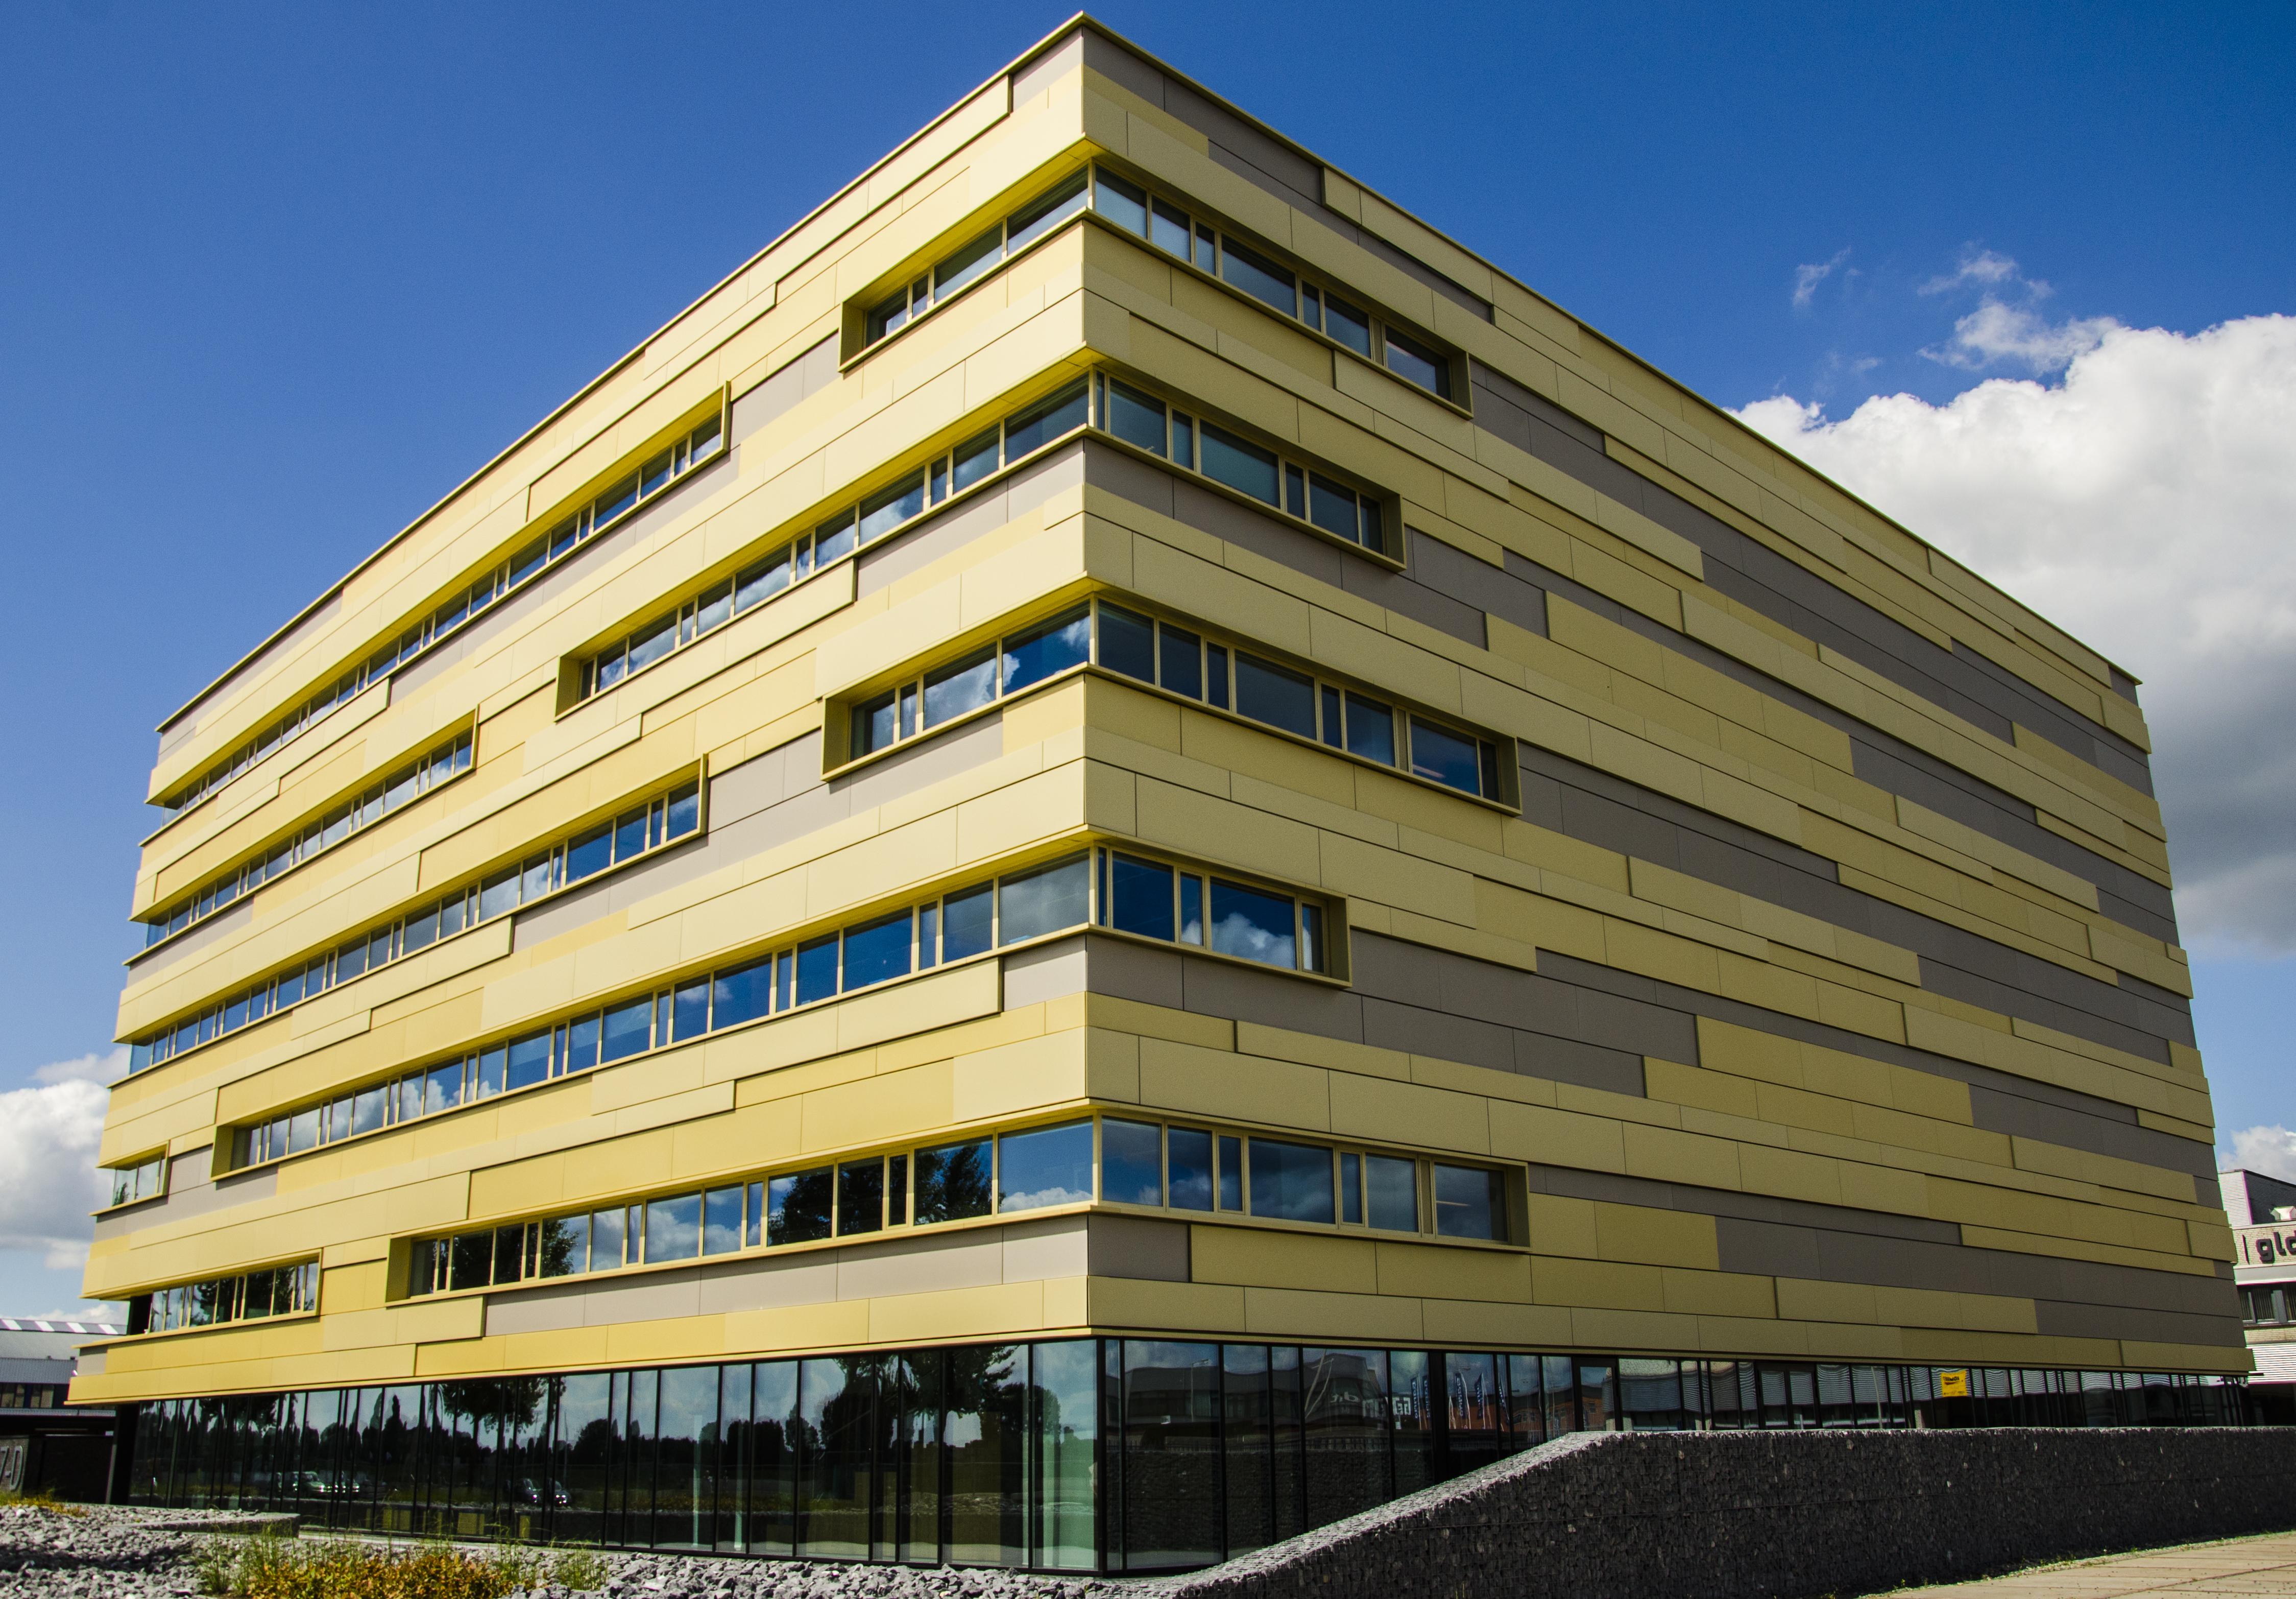 Archiefgebouw